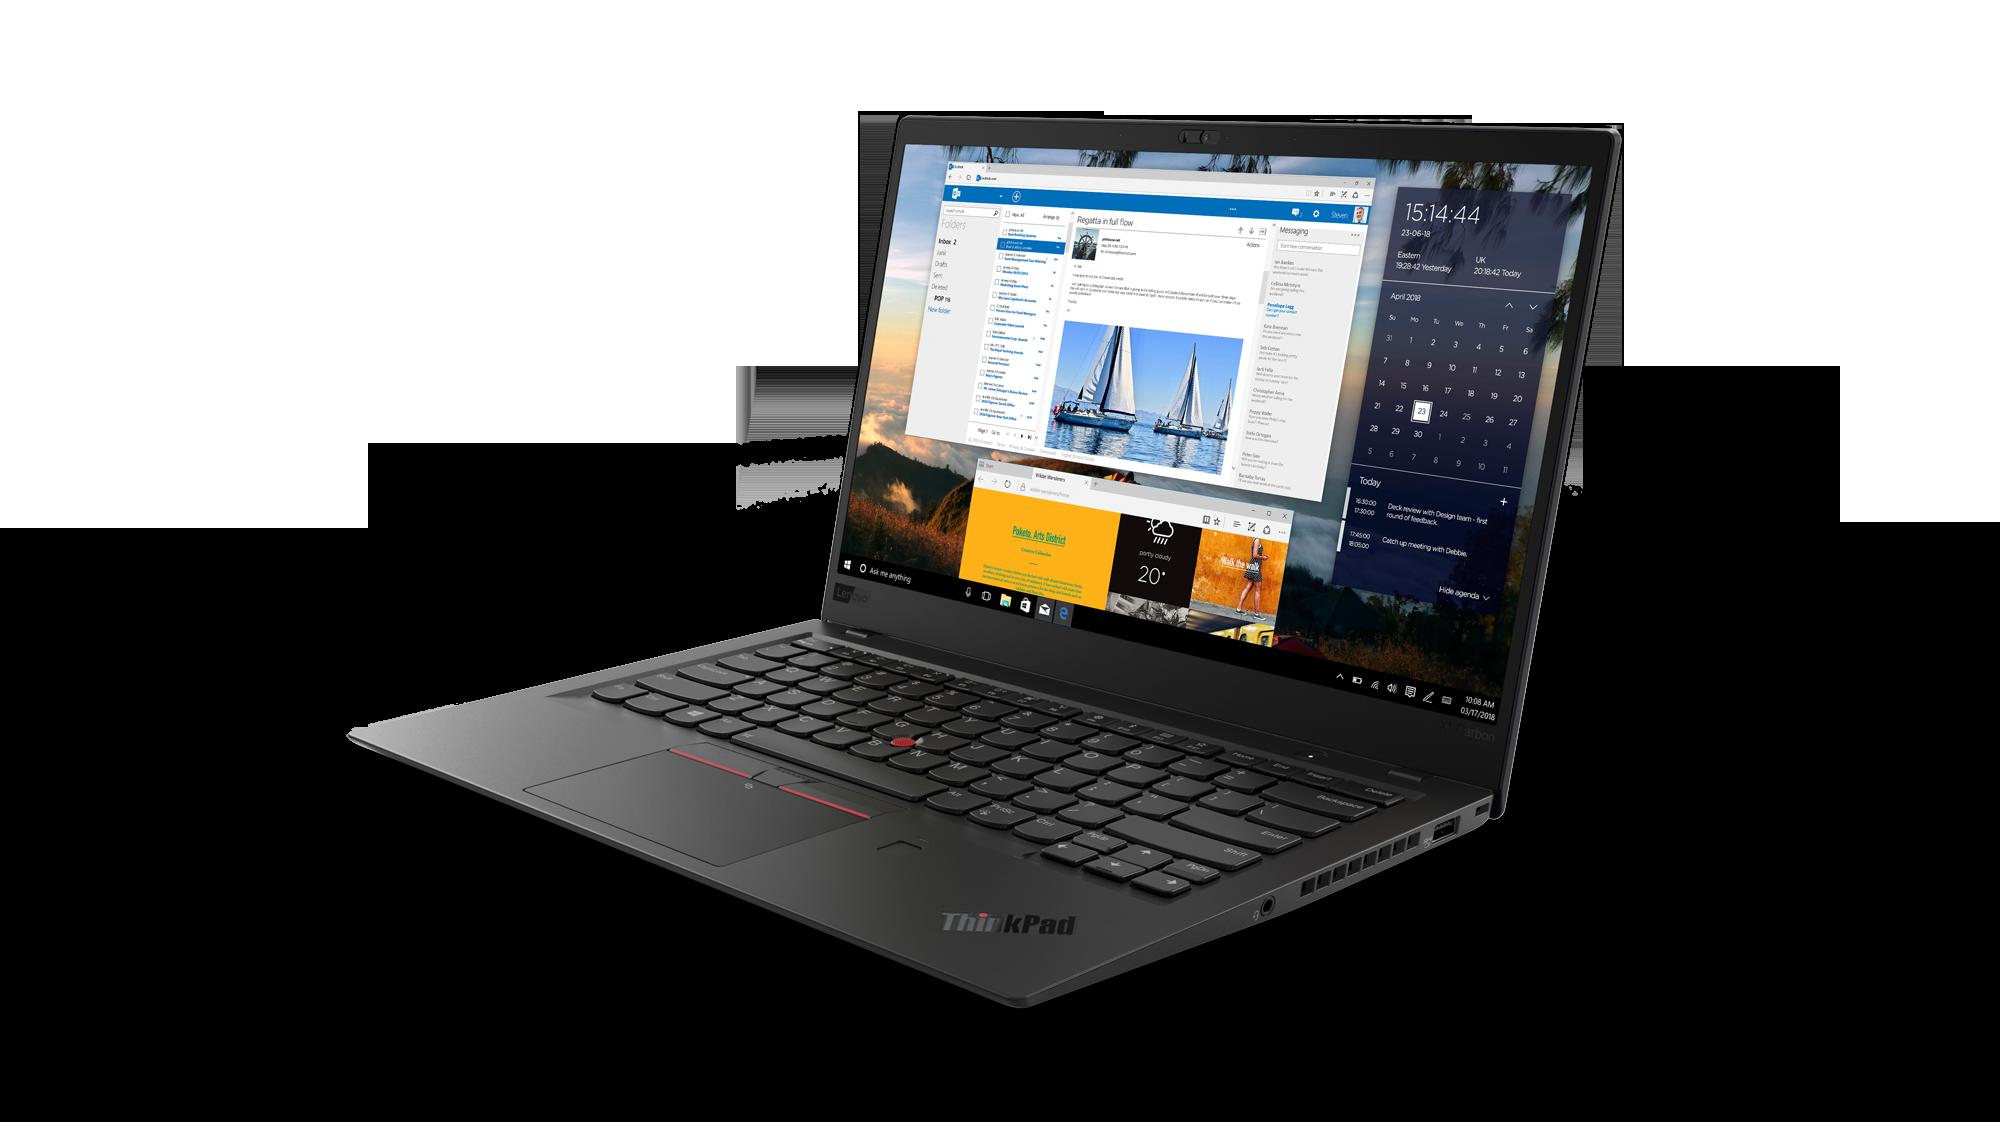 New Original laptop Lenovo ThinkPad USB 3.0 Dock Port